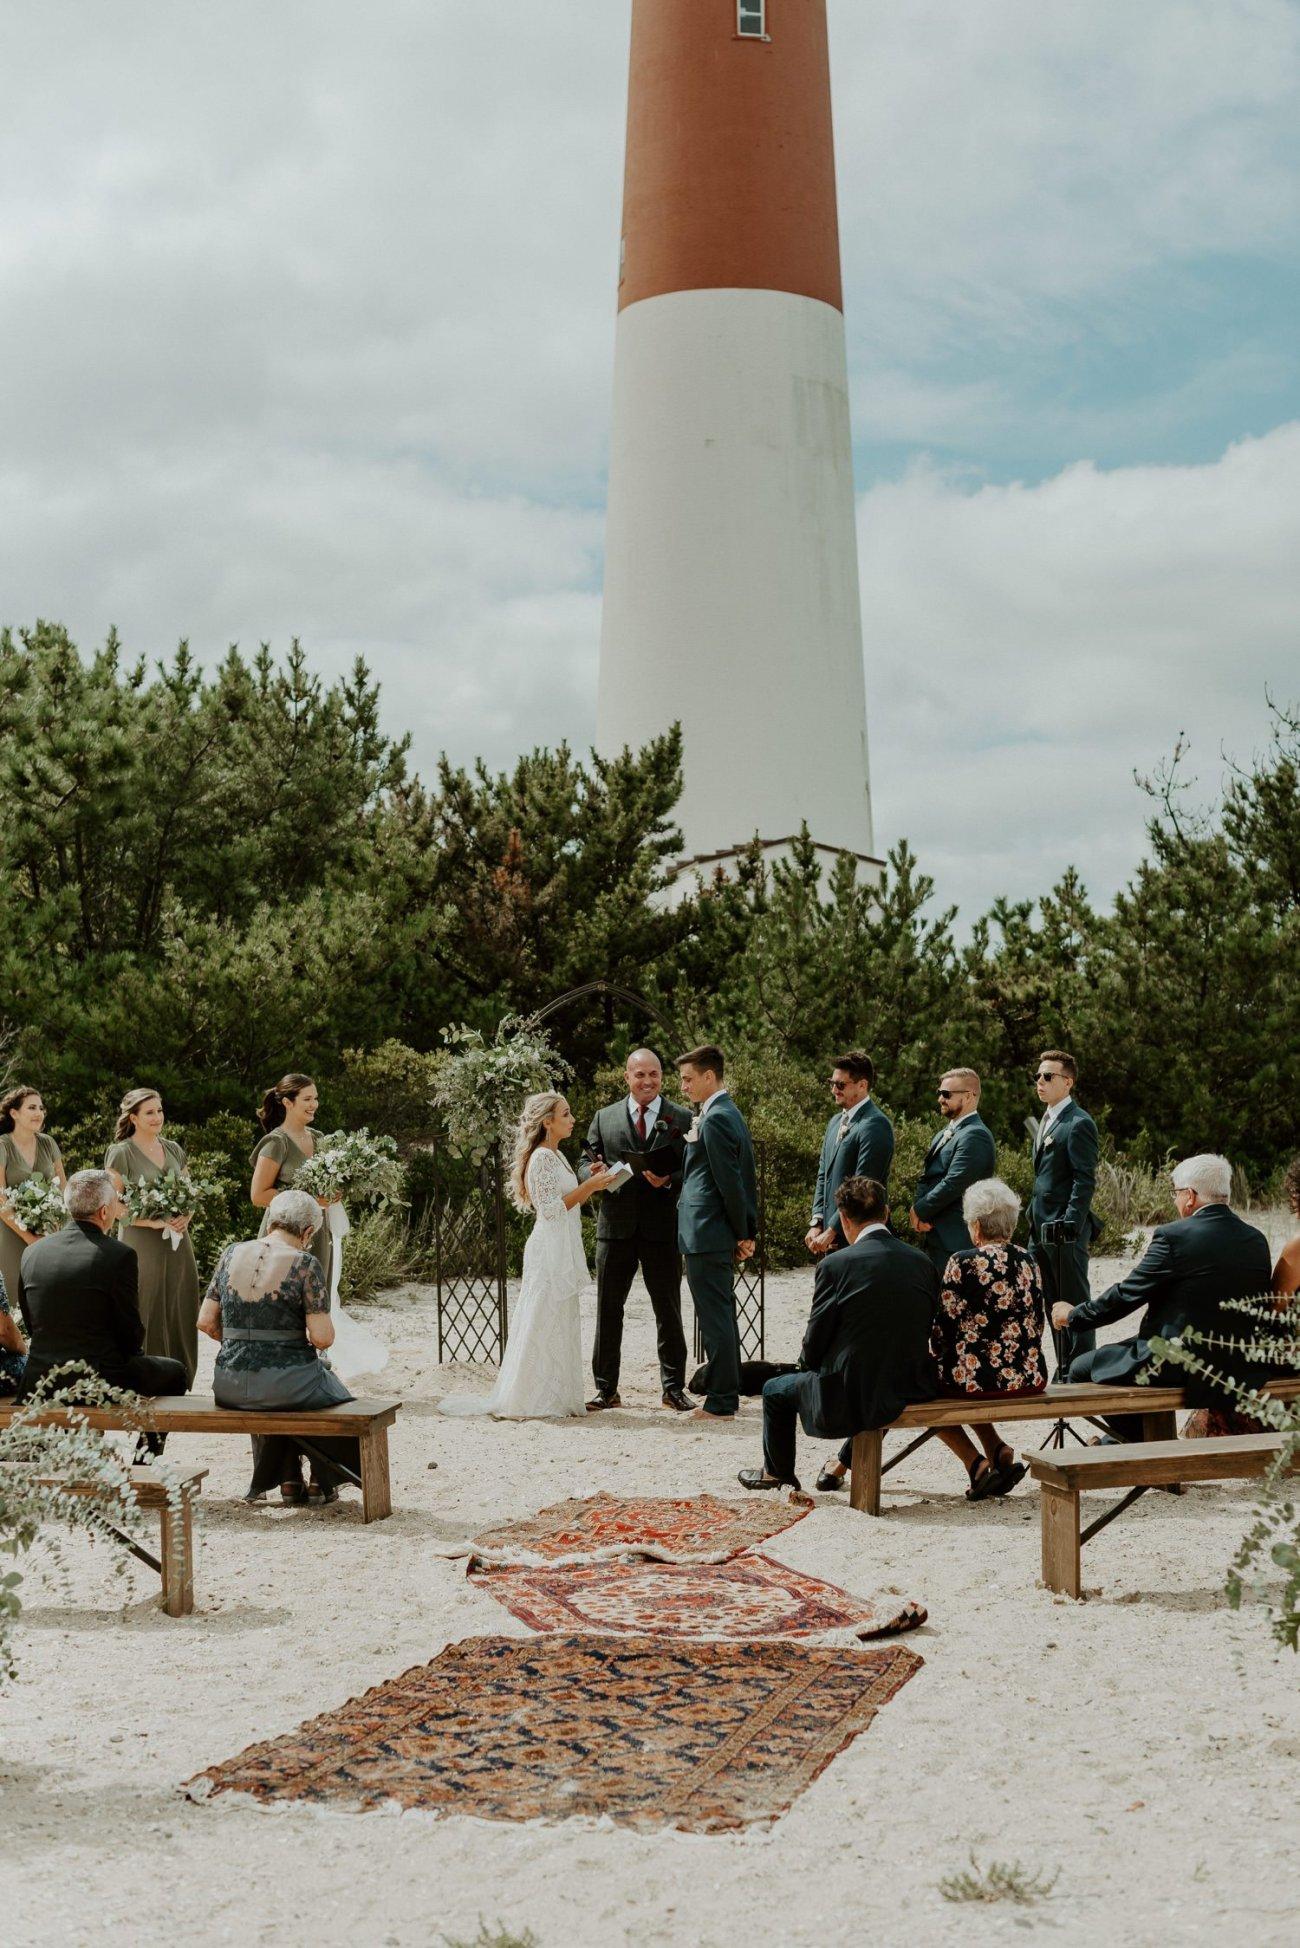 Long Beach Island Wedding Barnegat Lighthouse Wedding Ceremony New Jersey Wedding Anais Possamai Photography Oregon Wedding Photographer 0037